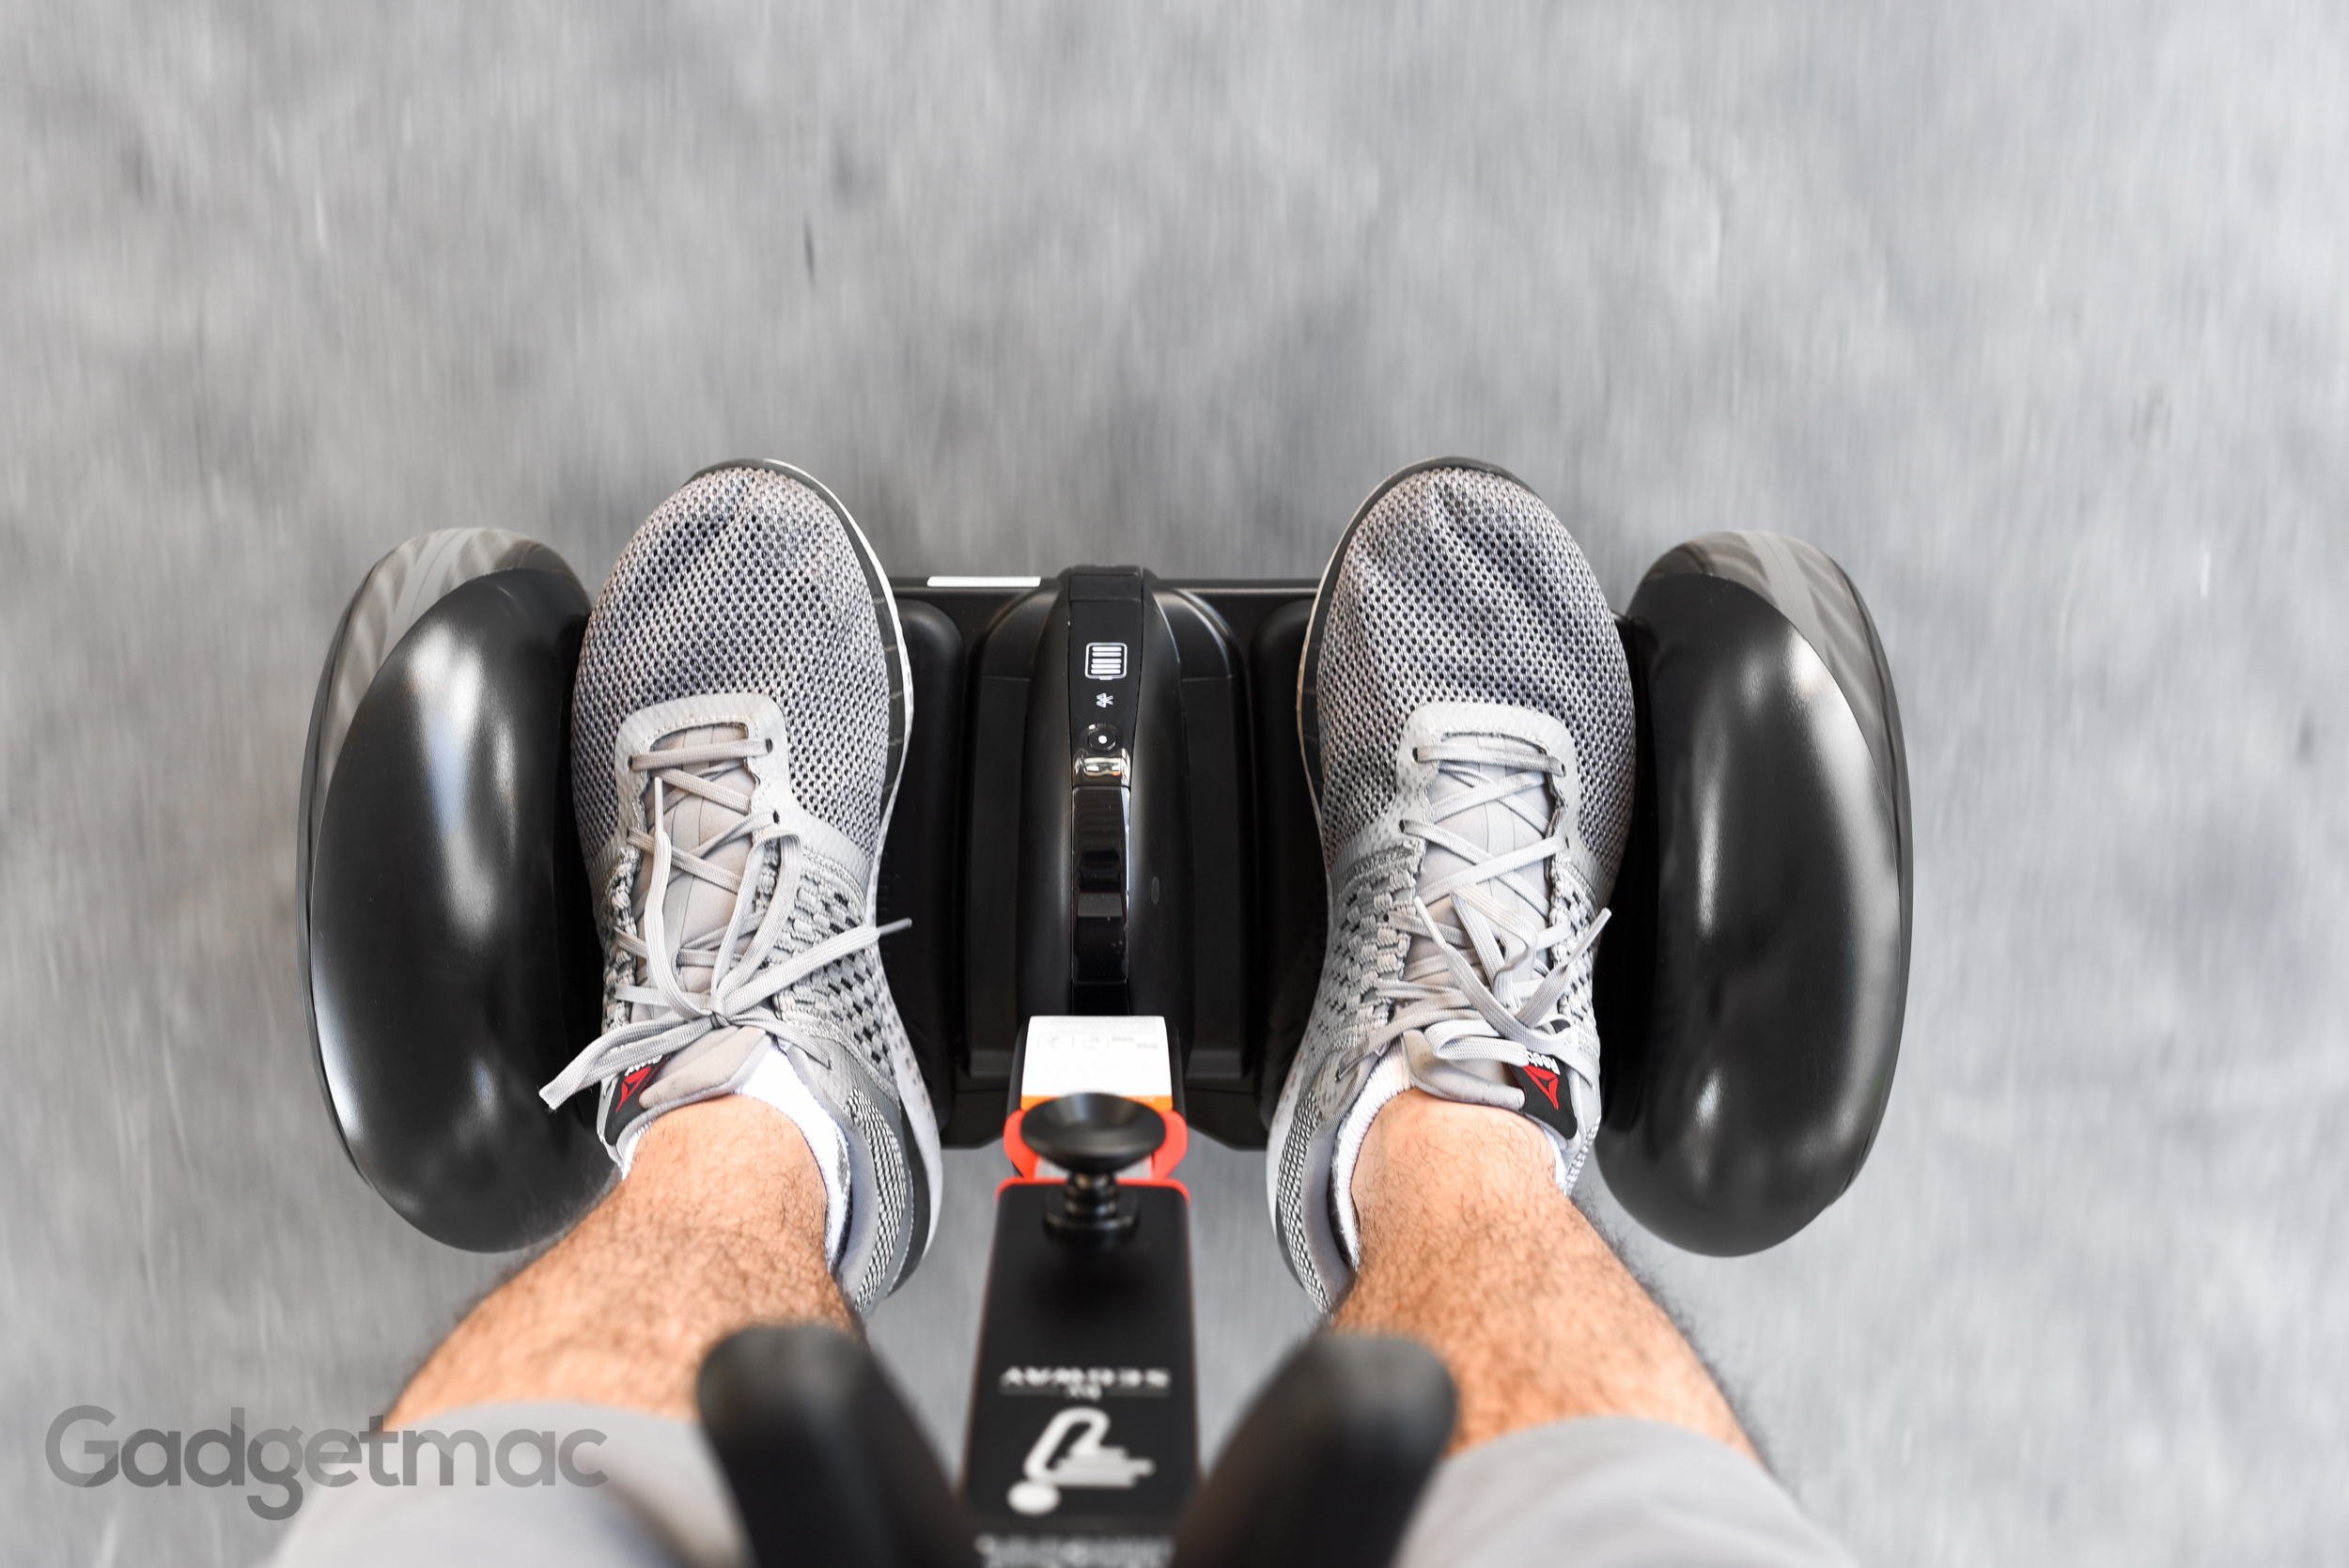 segway-minipro-self-balancing-scooter.jpg